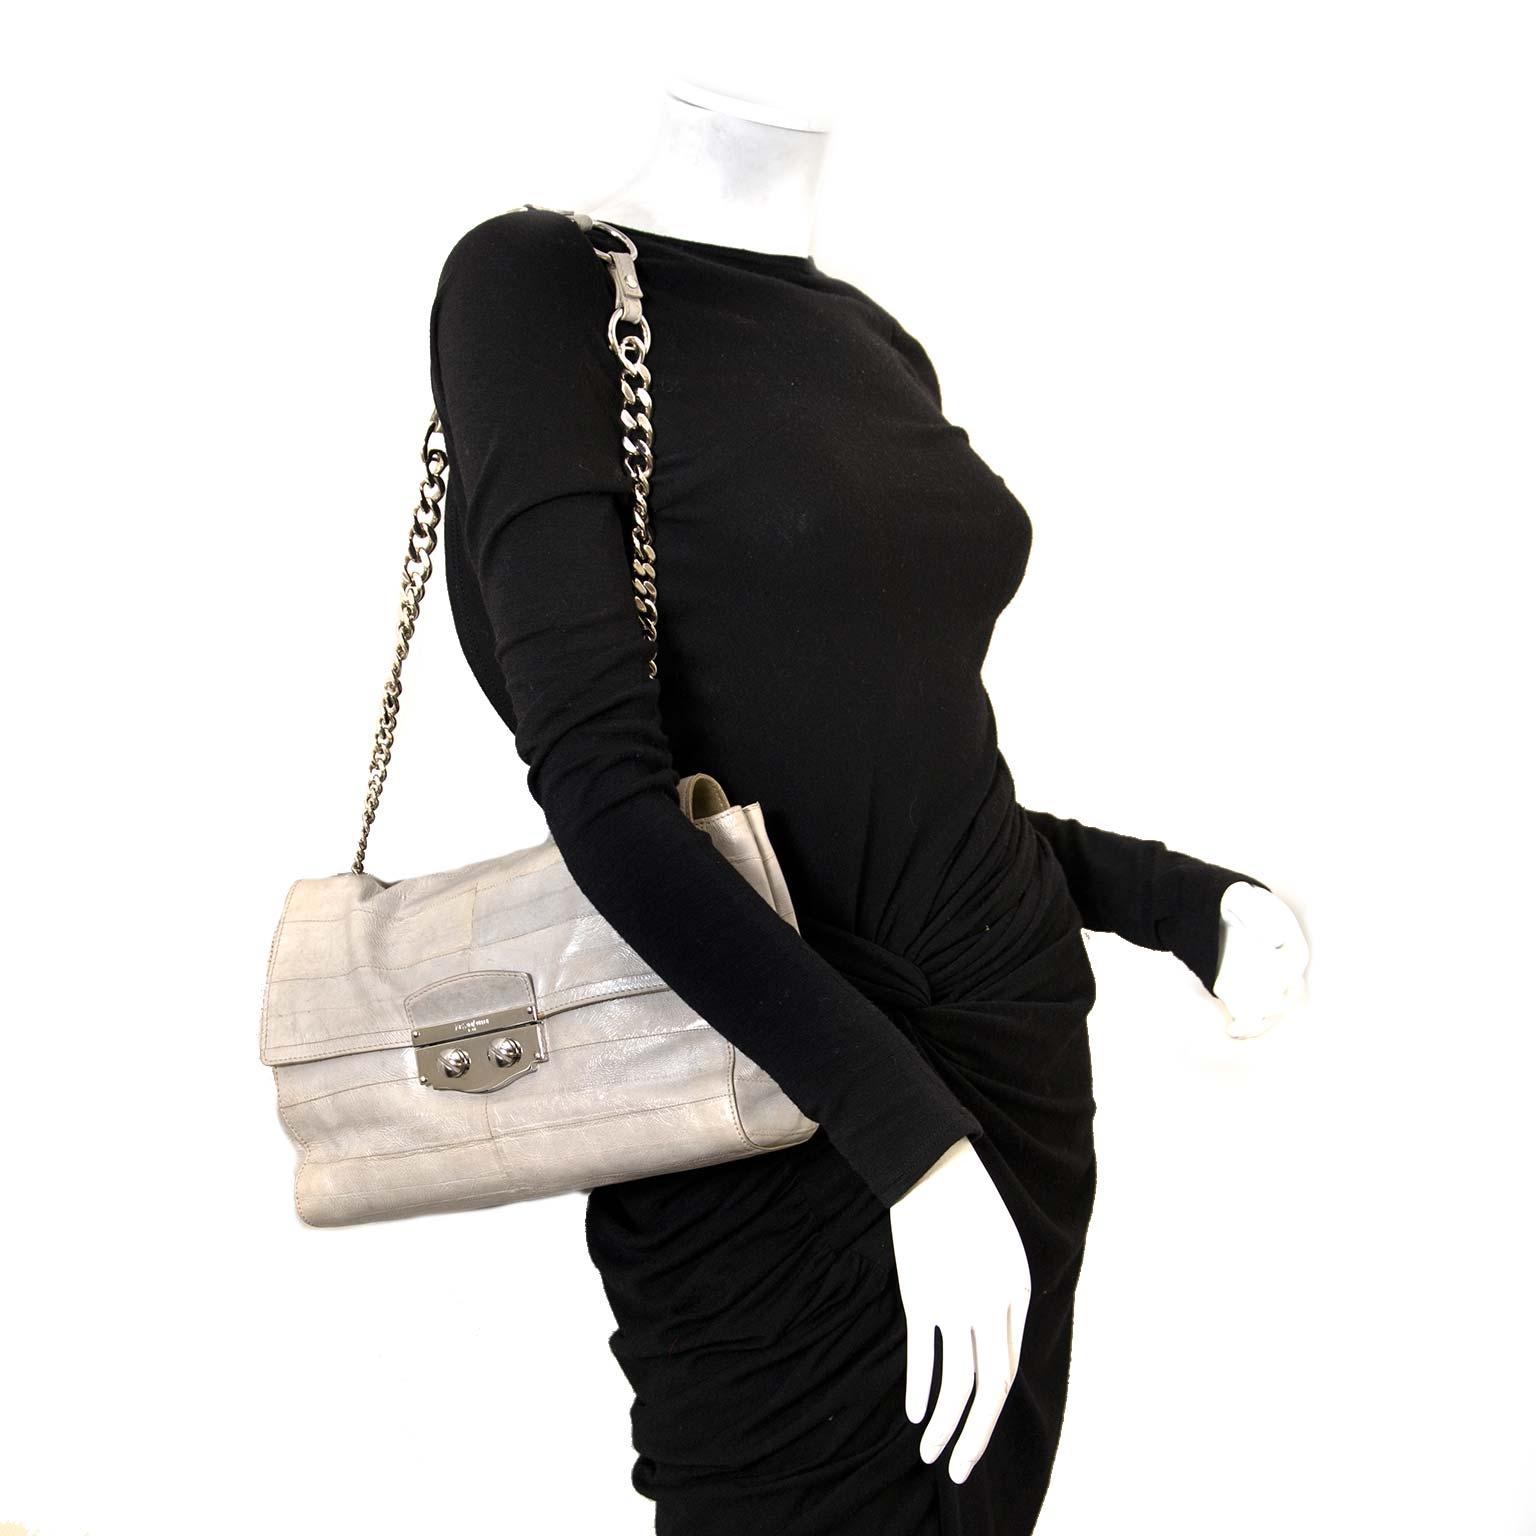 Yves Saint Laurent Le Sixieme Grey Leather Bag kopen en verkopen